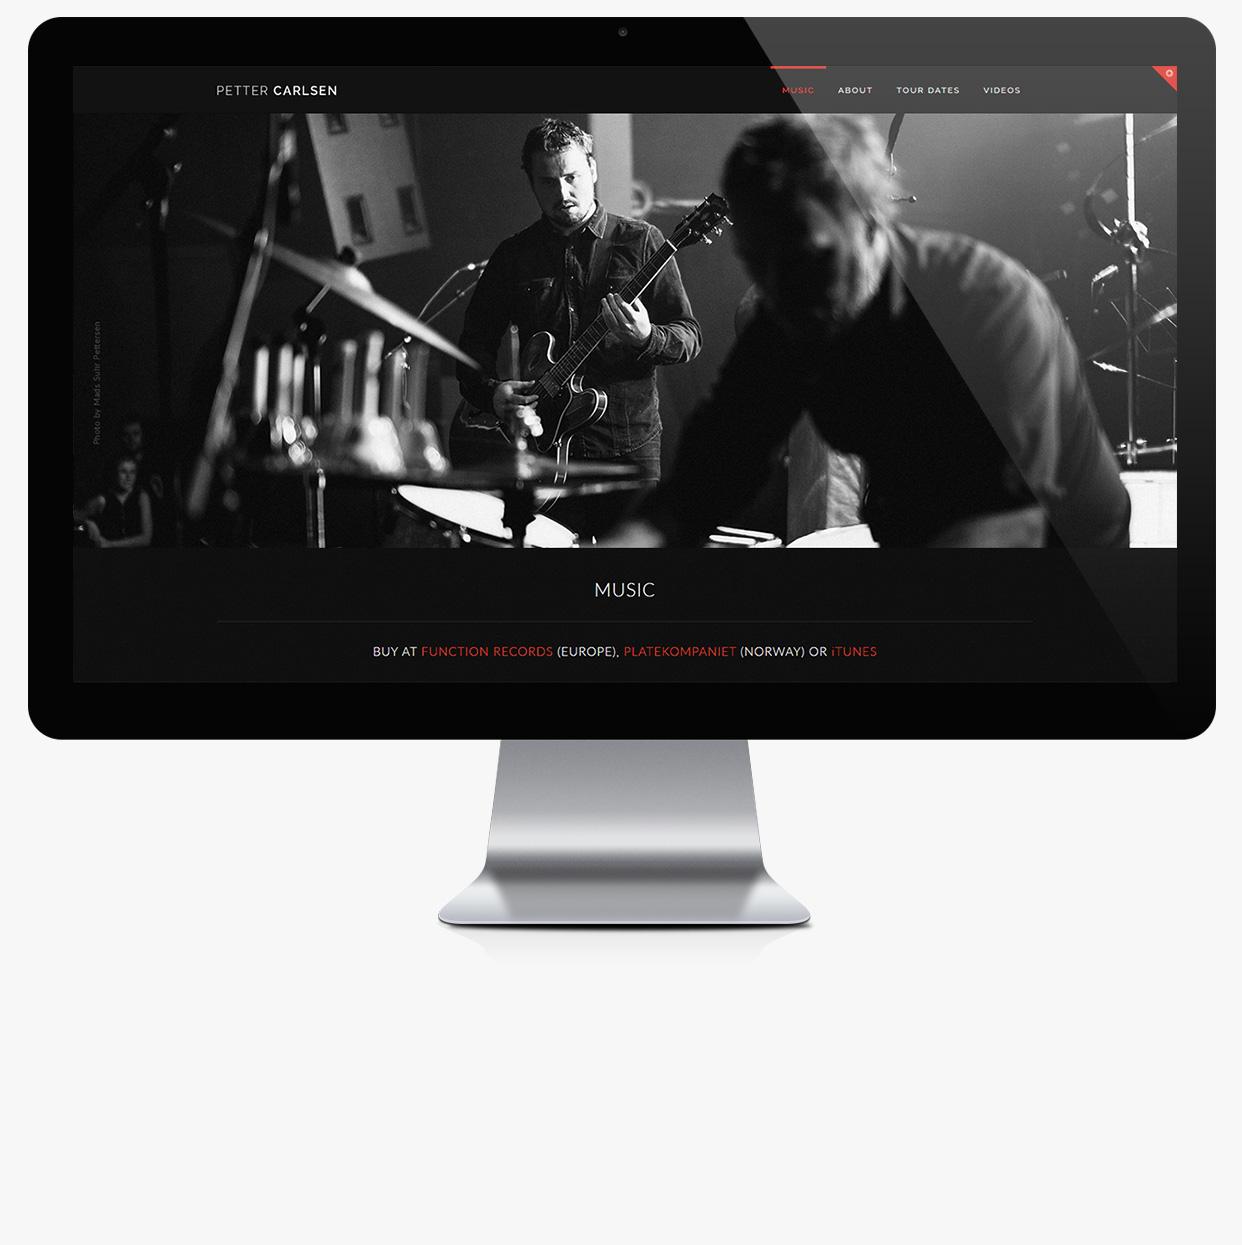 pettercarlsen-web-music